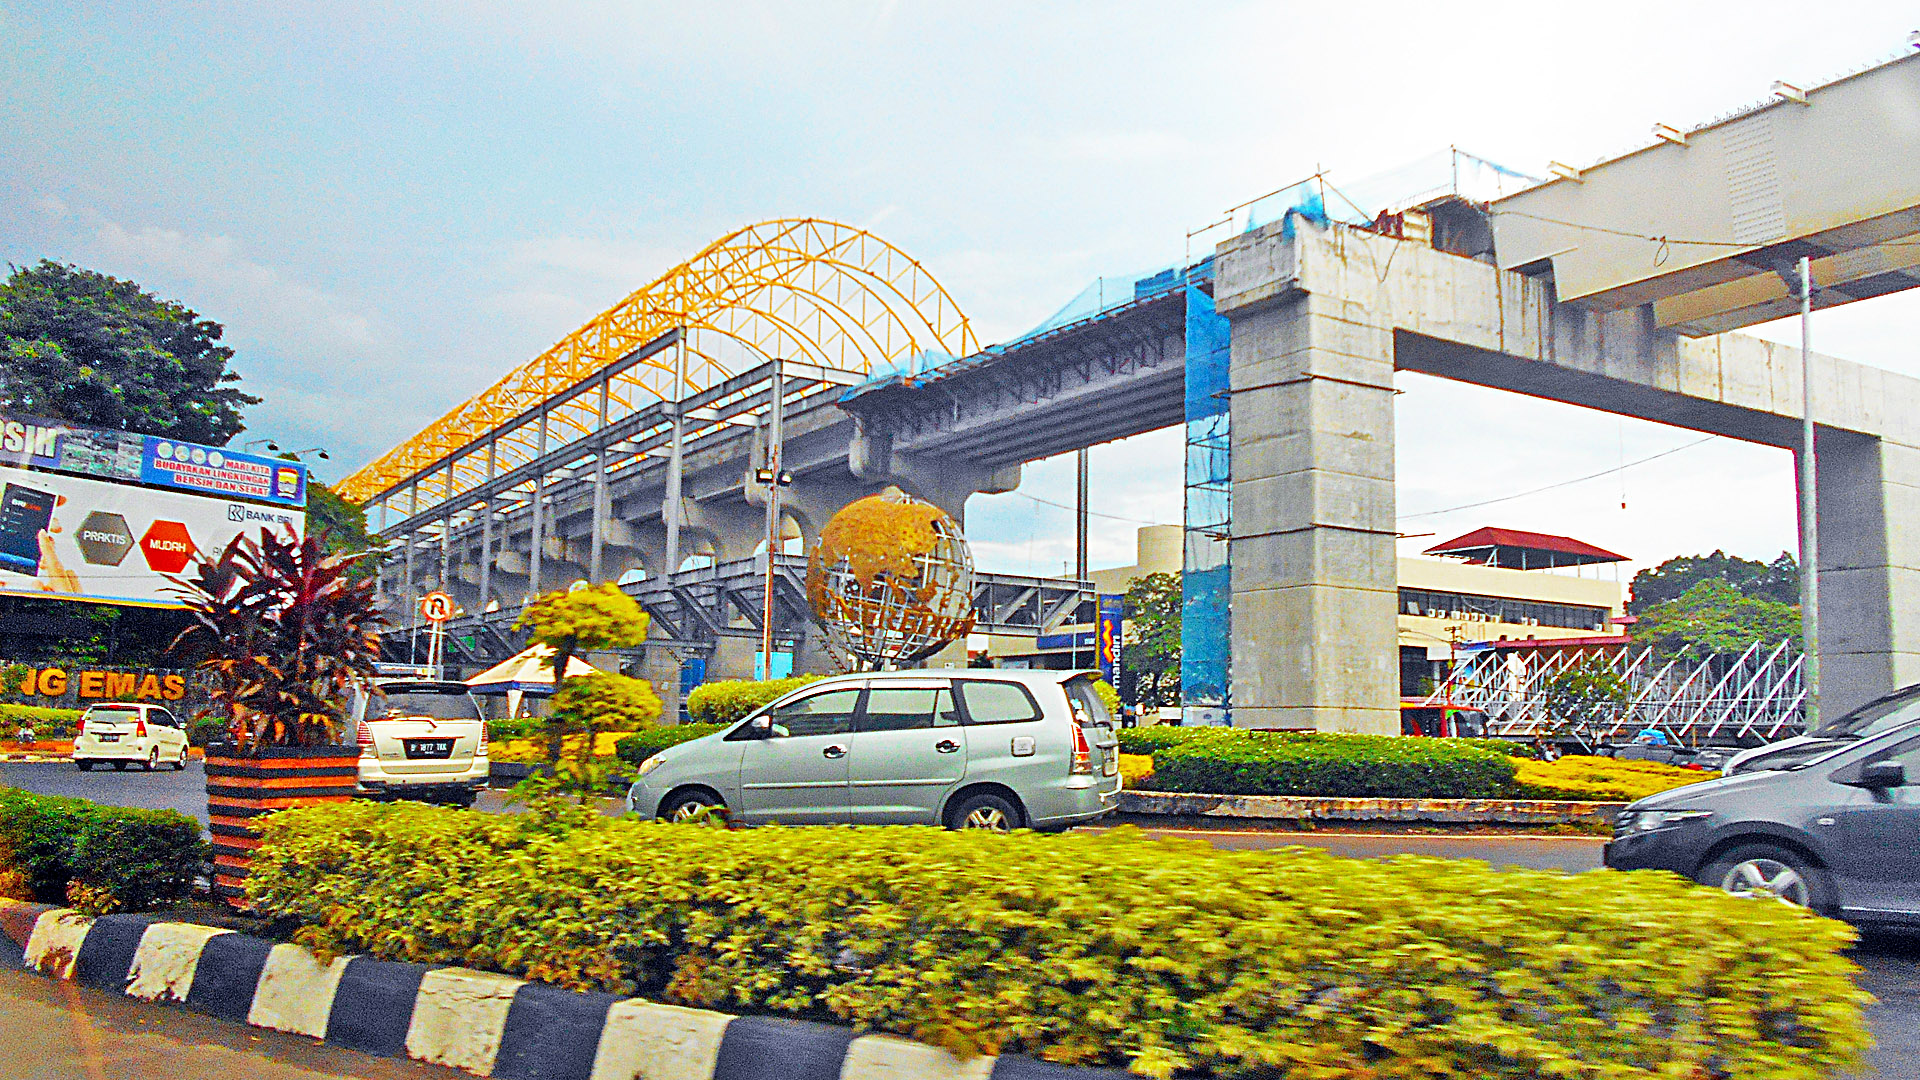 File:Palembang LRT, June 2017 (3).jpg - Wikimedia Commons